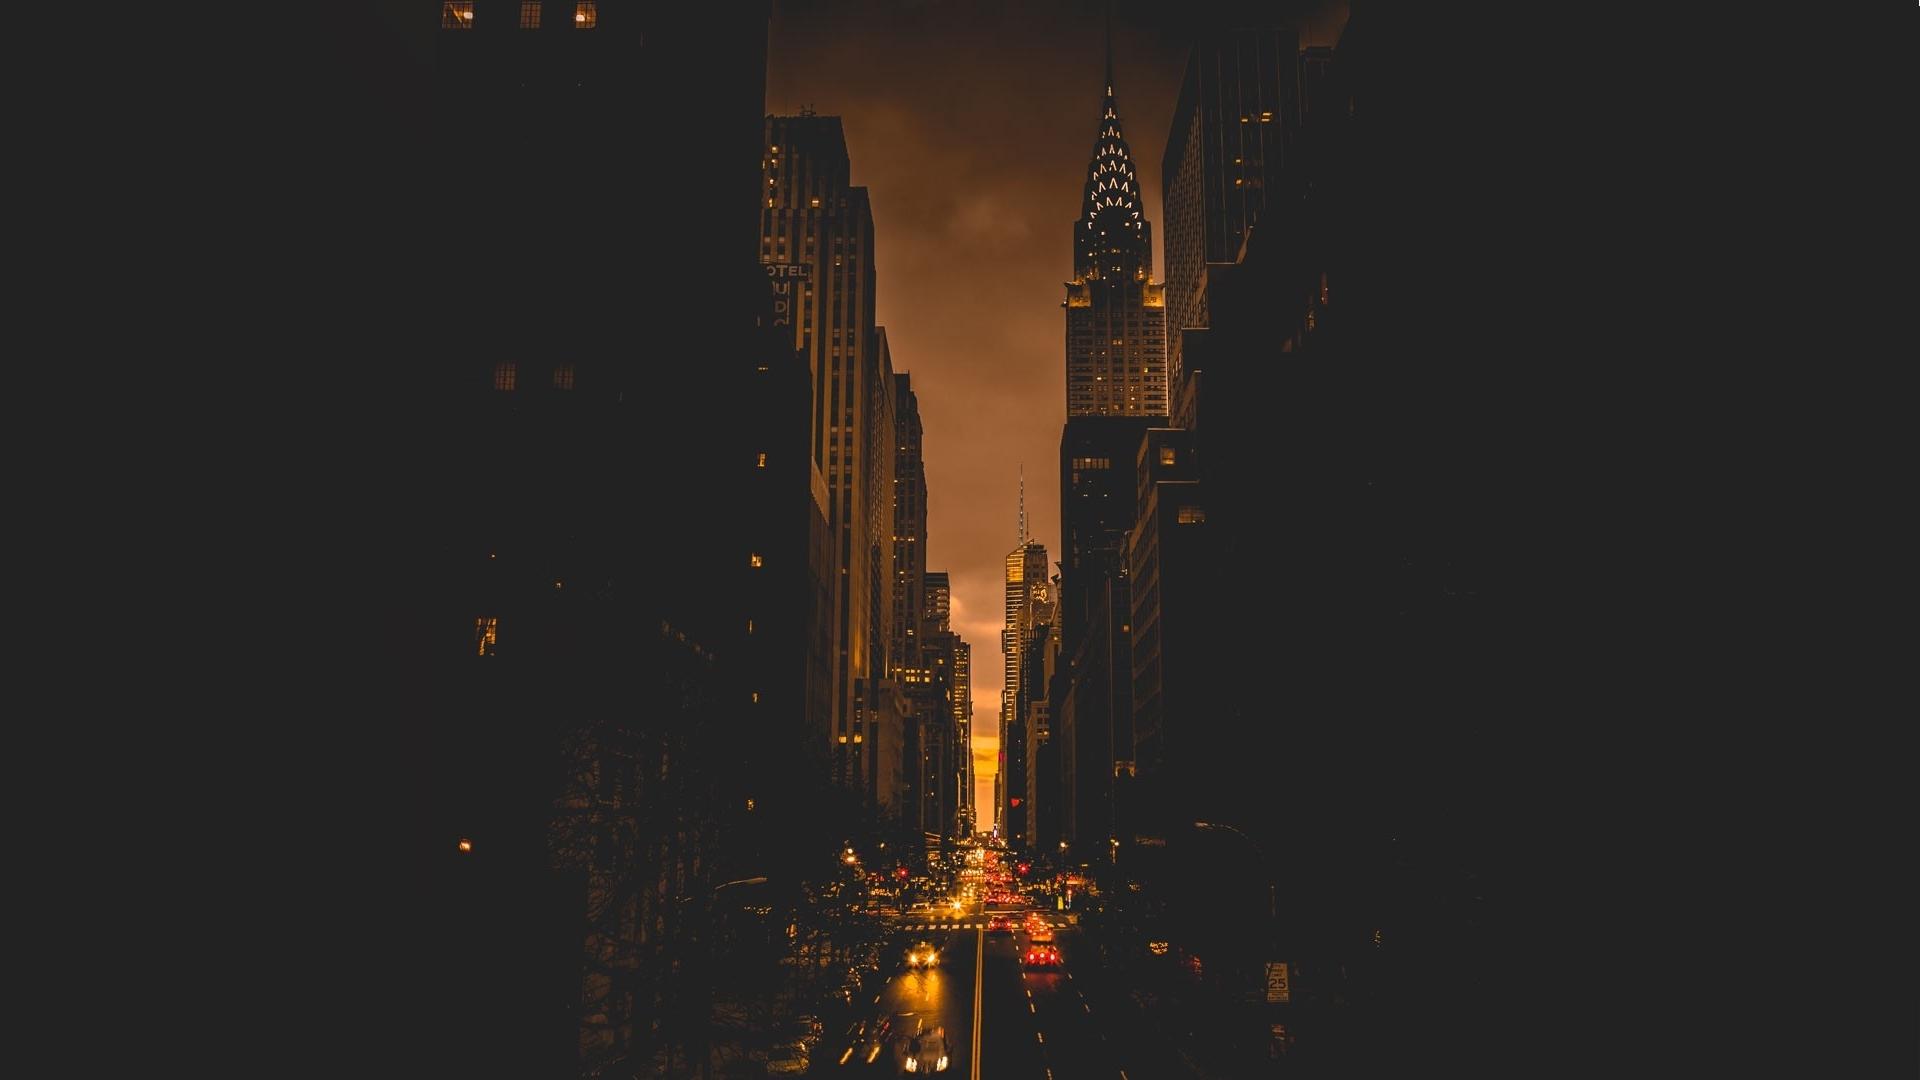 1920x1080 New York City Evening Laptop Full Hd 1080p Hd 4k